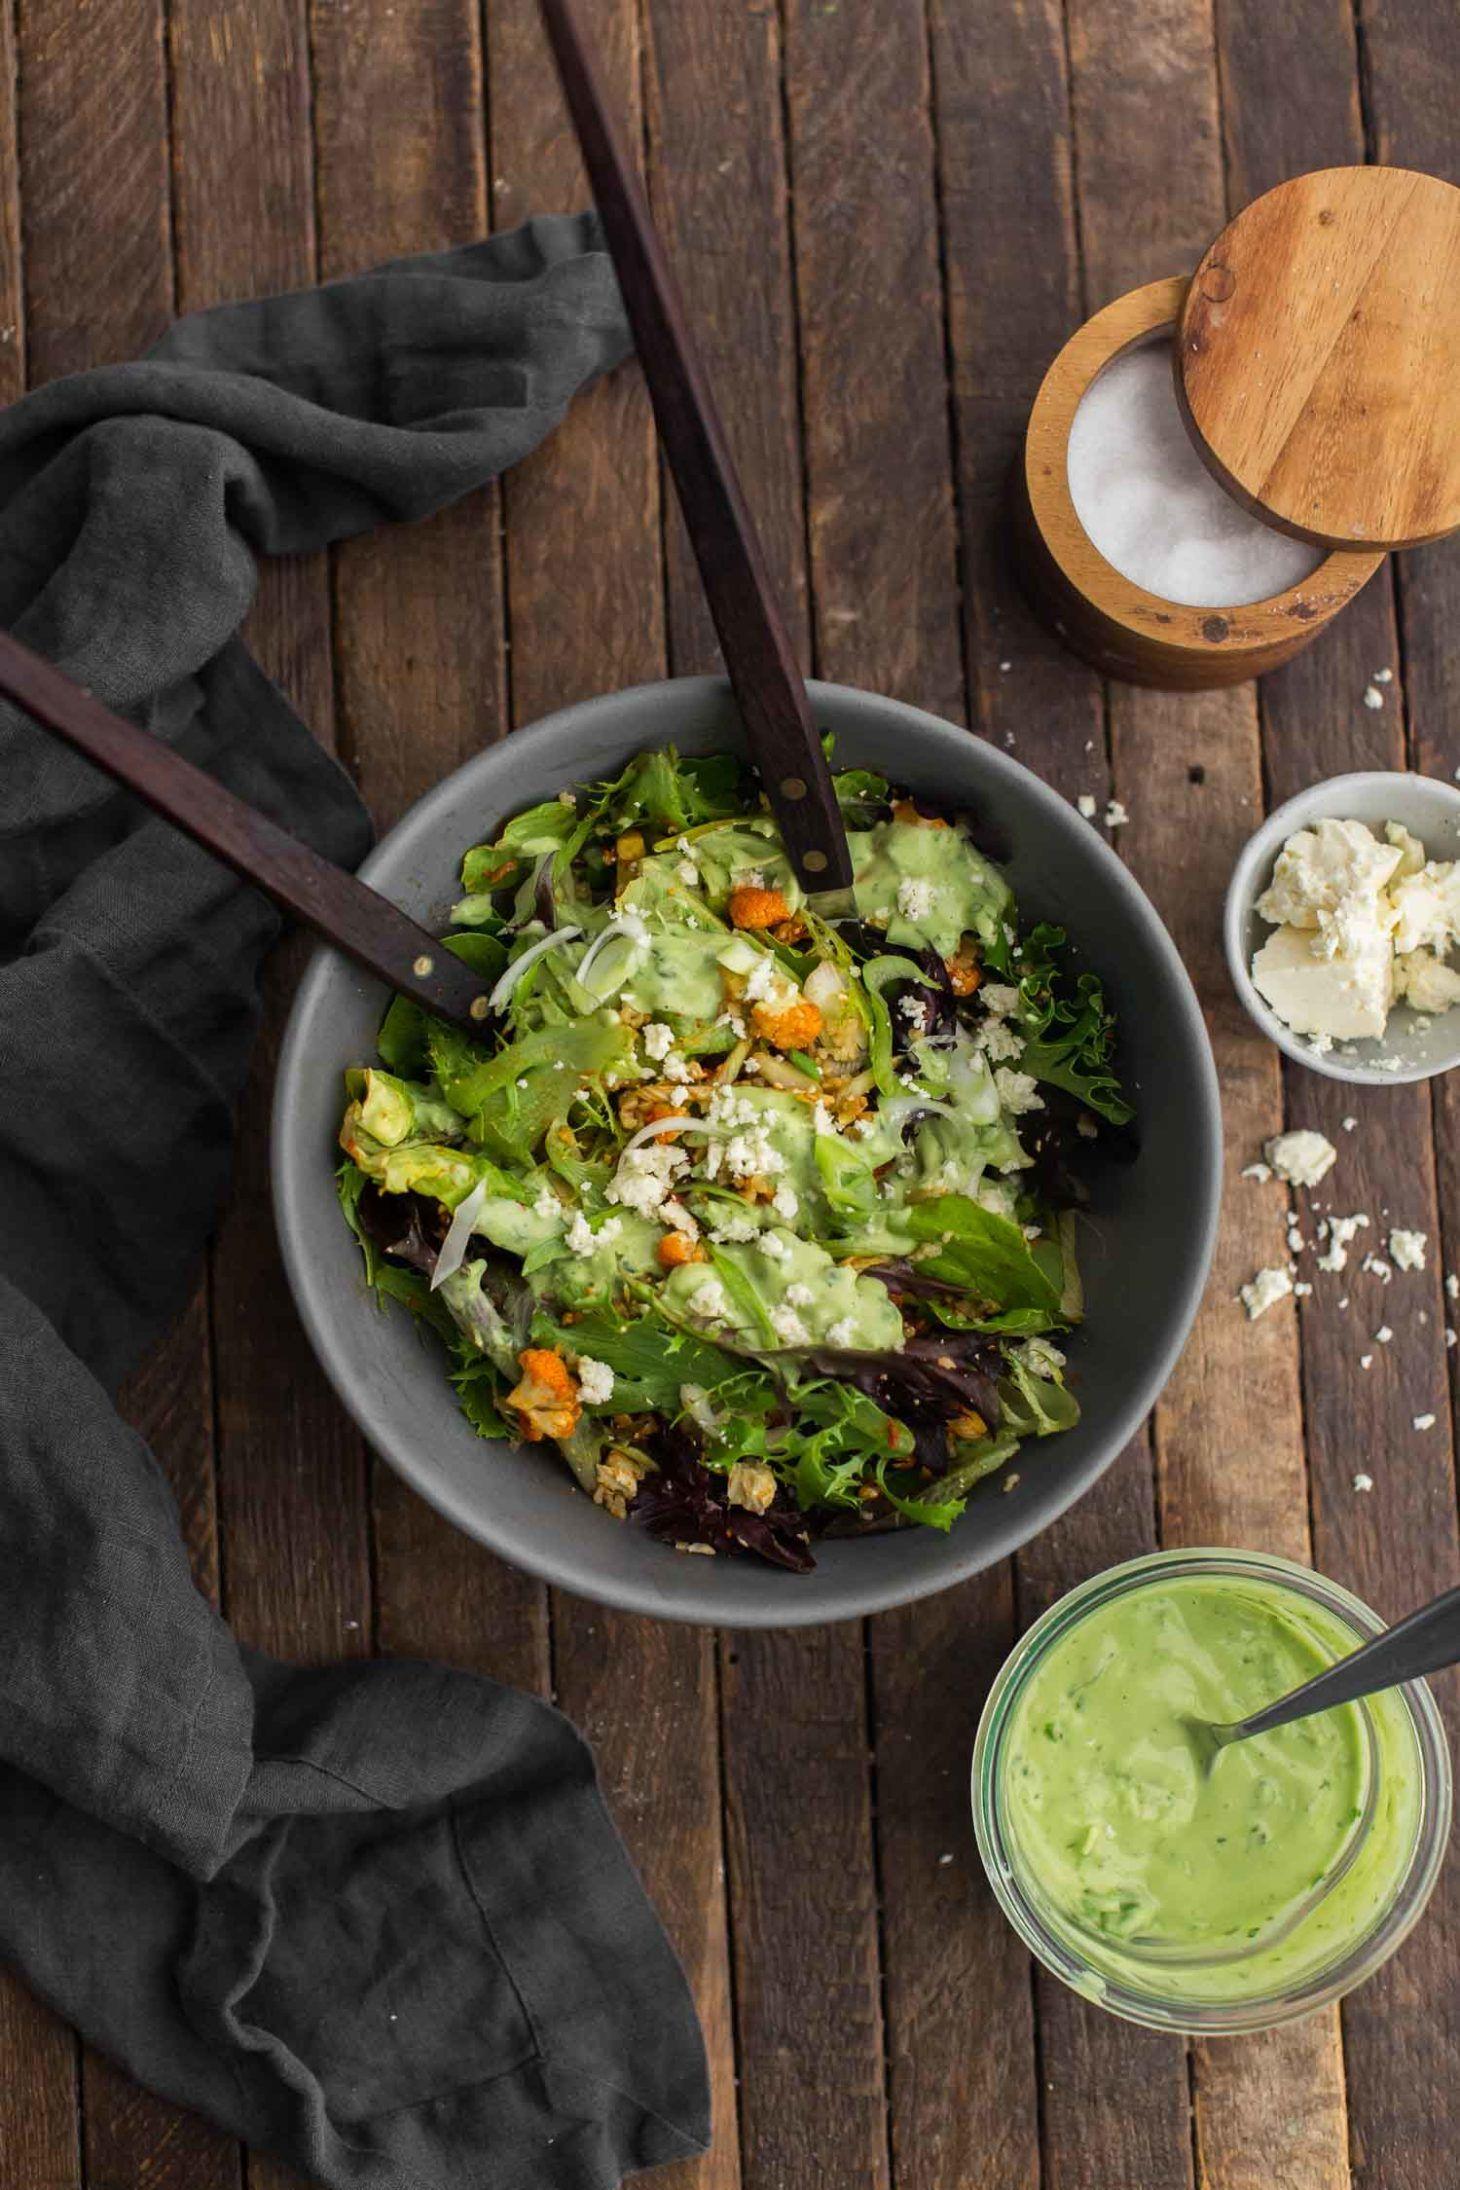 Harissa Roasted Cauliflower Salad with Freekeh and Lemon-Avocado Dressing featuring @ca_avocados | Naturally Ella